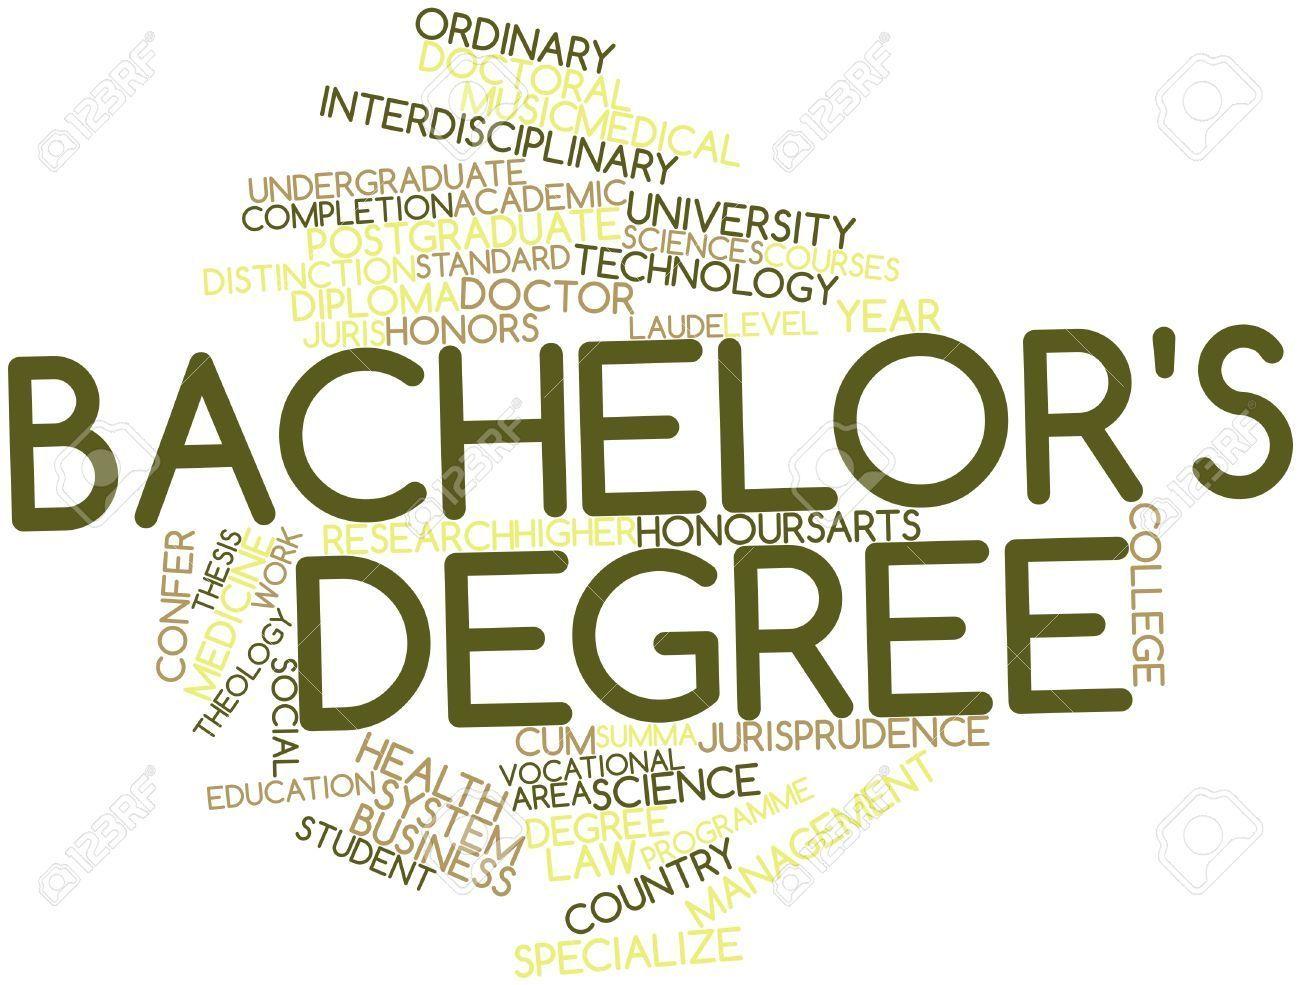 Pin By Keene On Alex International University Word Cloud Bachelors Degree